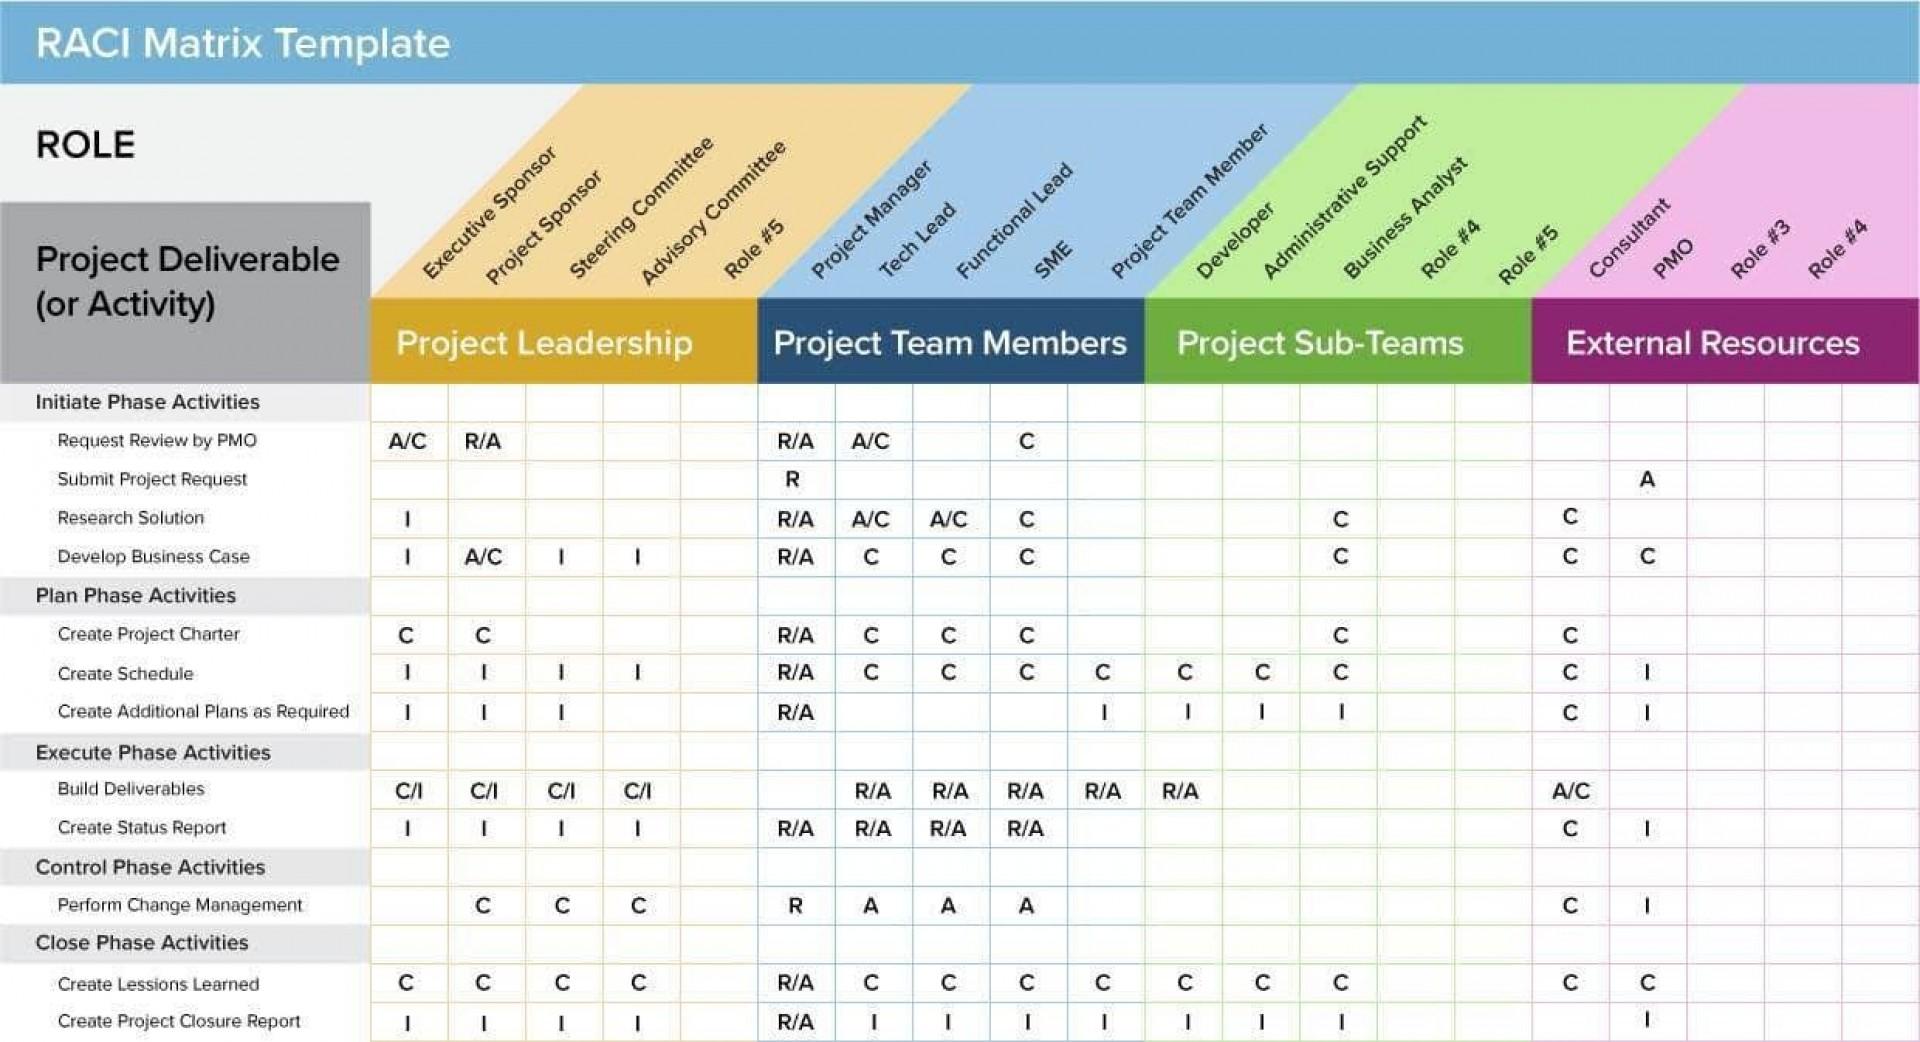 006 Astounding Agile Project Management Template Excel Free Design 1920